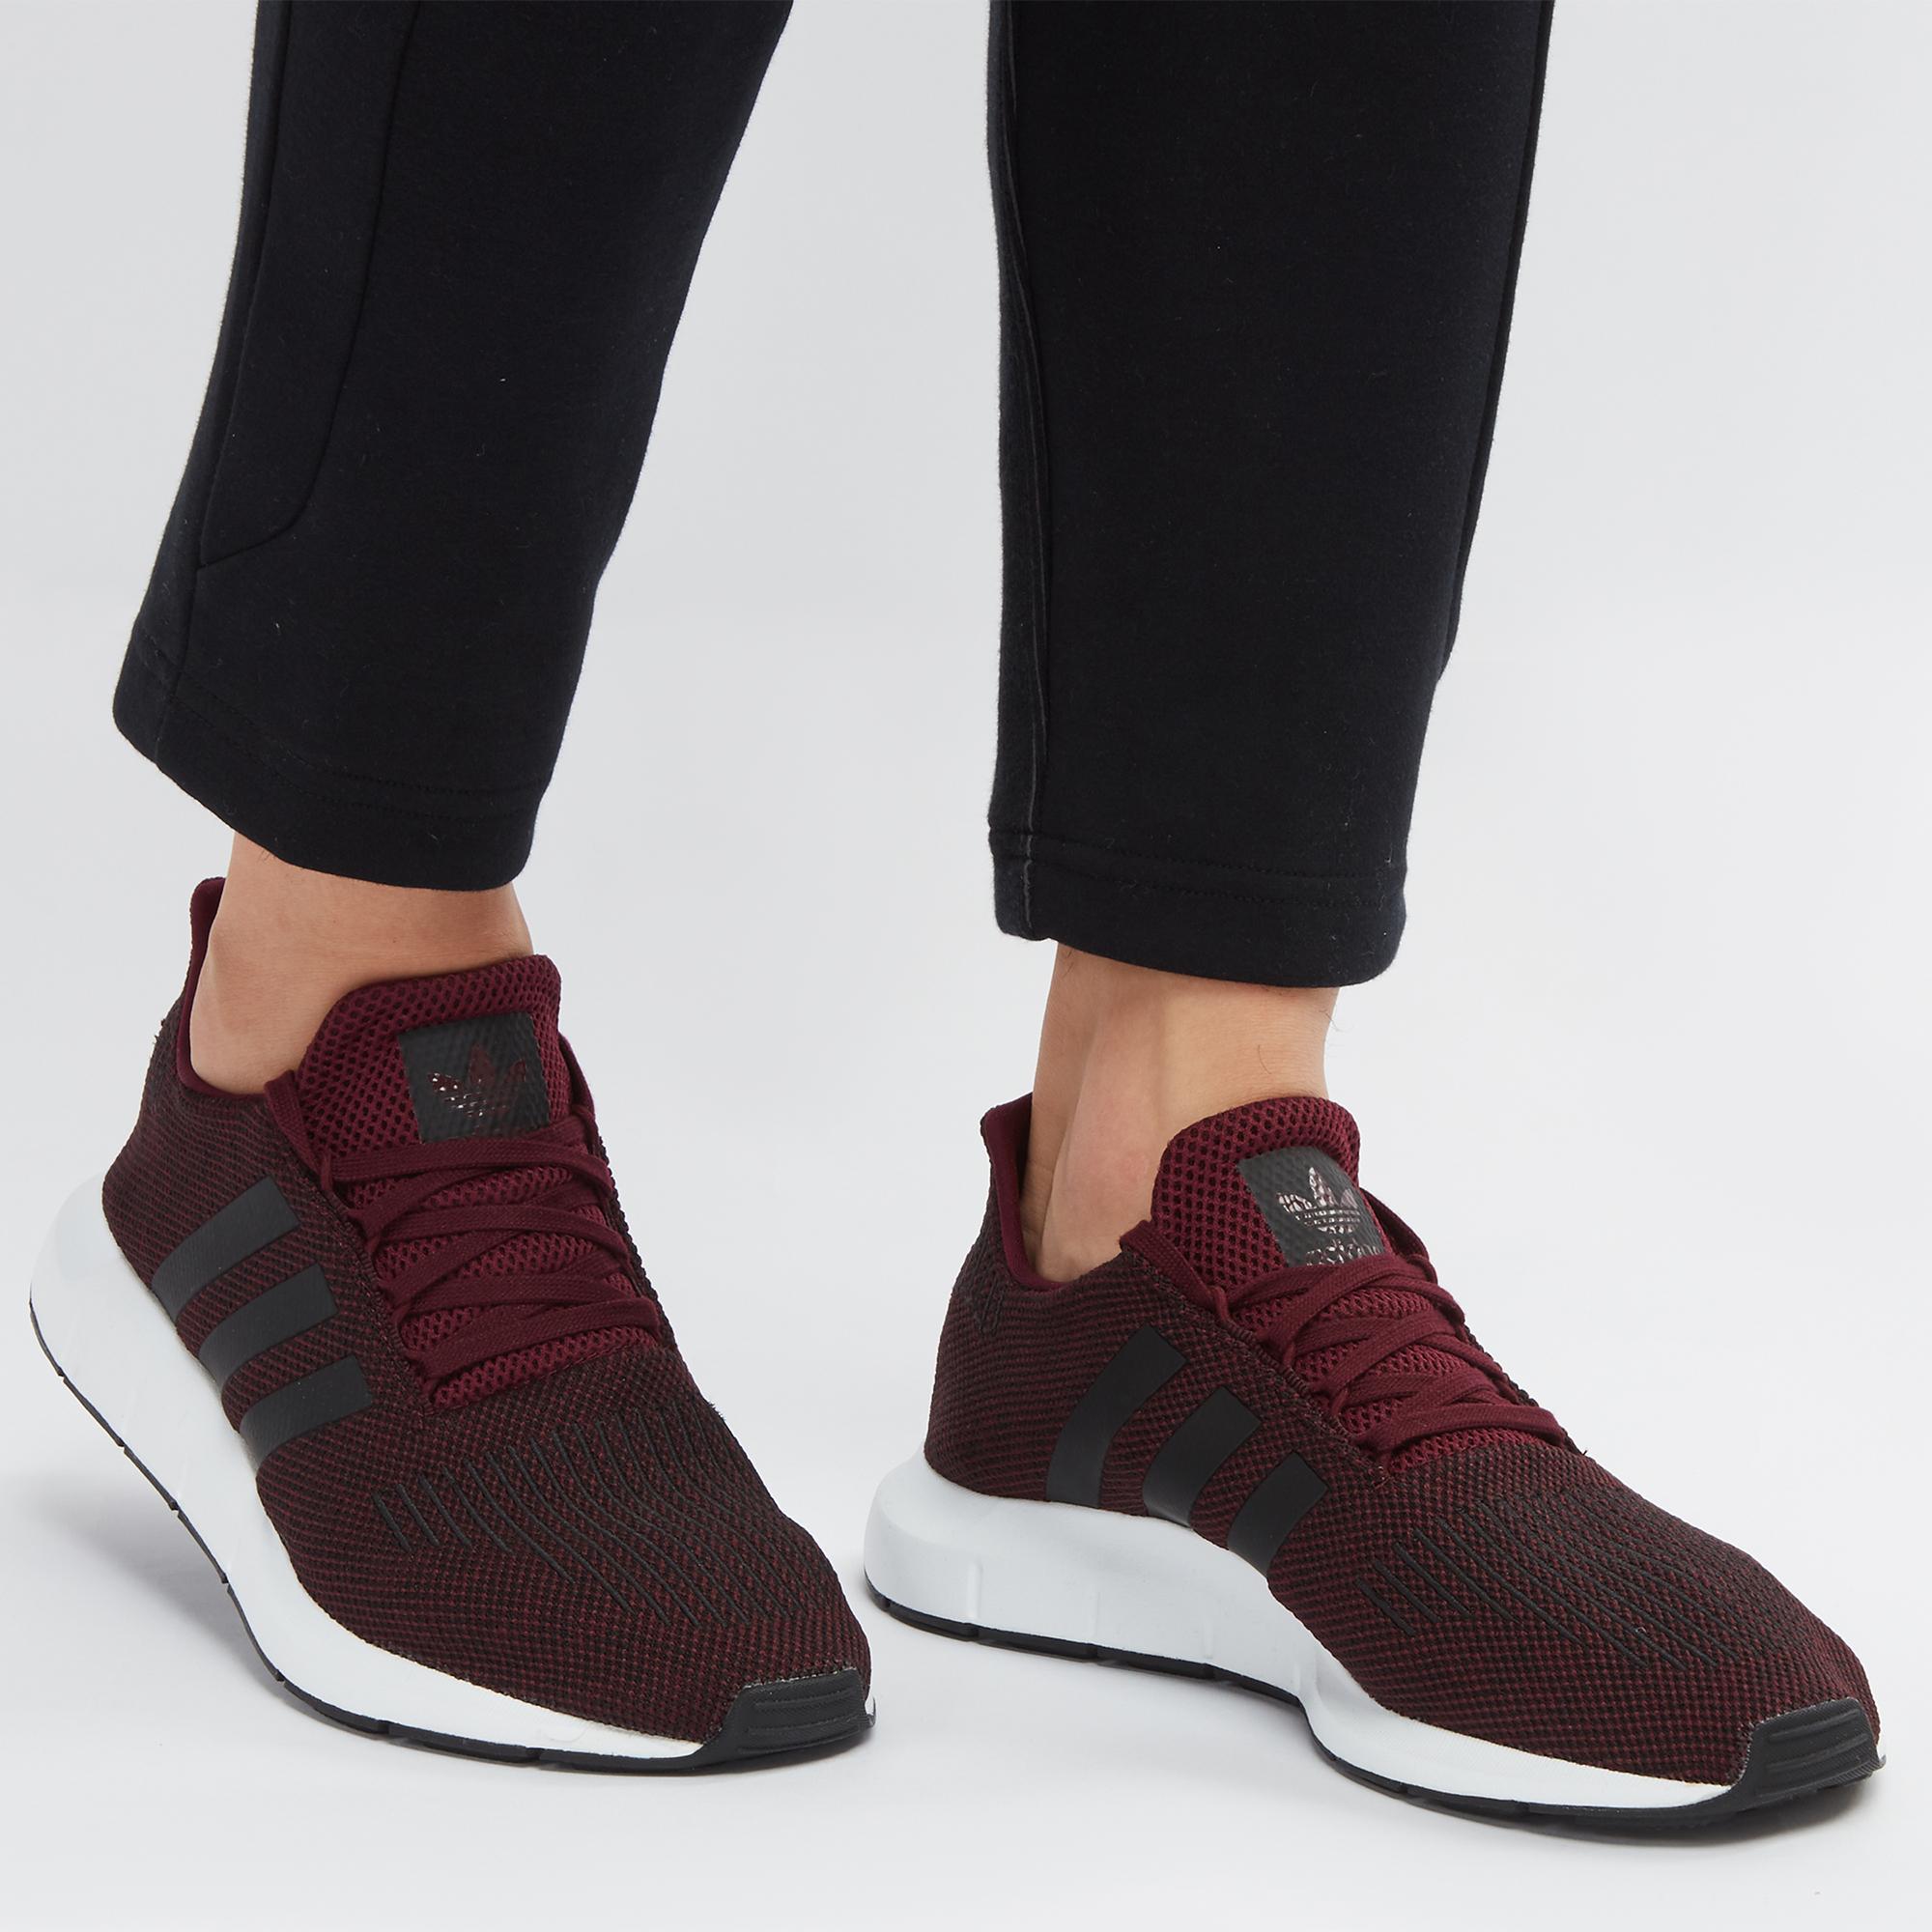 b010815033b26 Adidas Originals Swift Run Shoe Adft Cq2118 in Riyadh